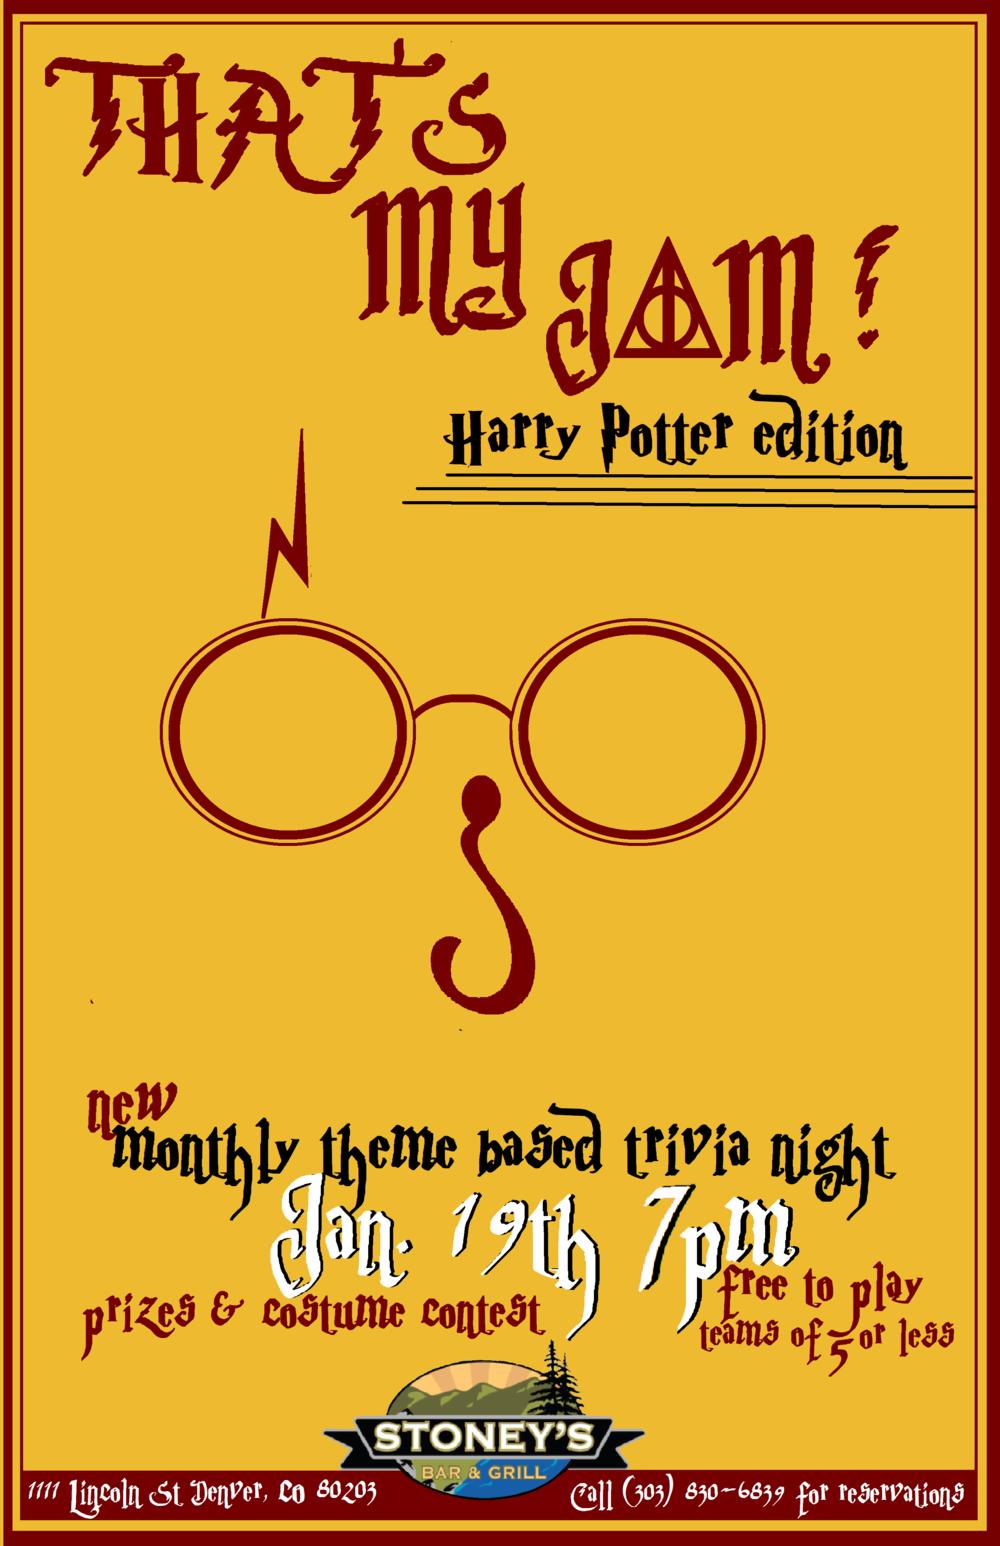 harry potter trivia.png